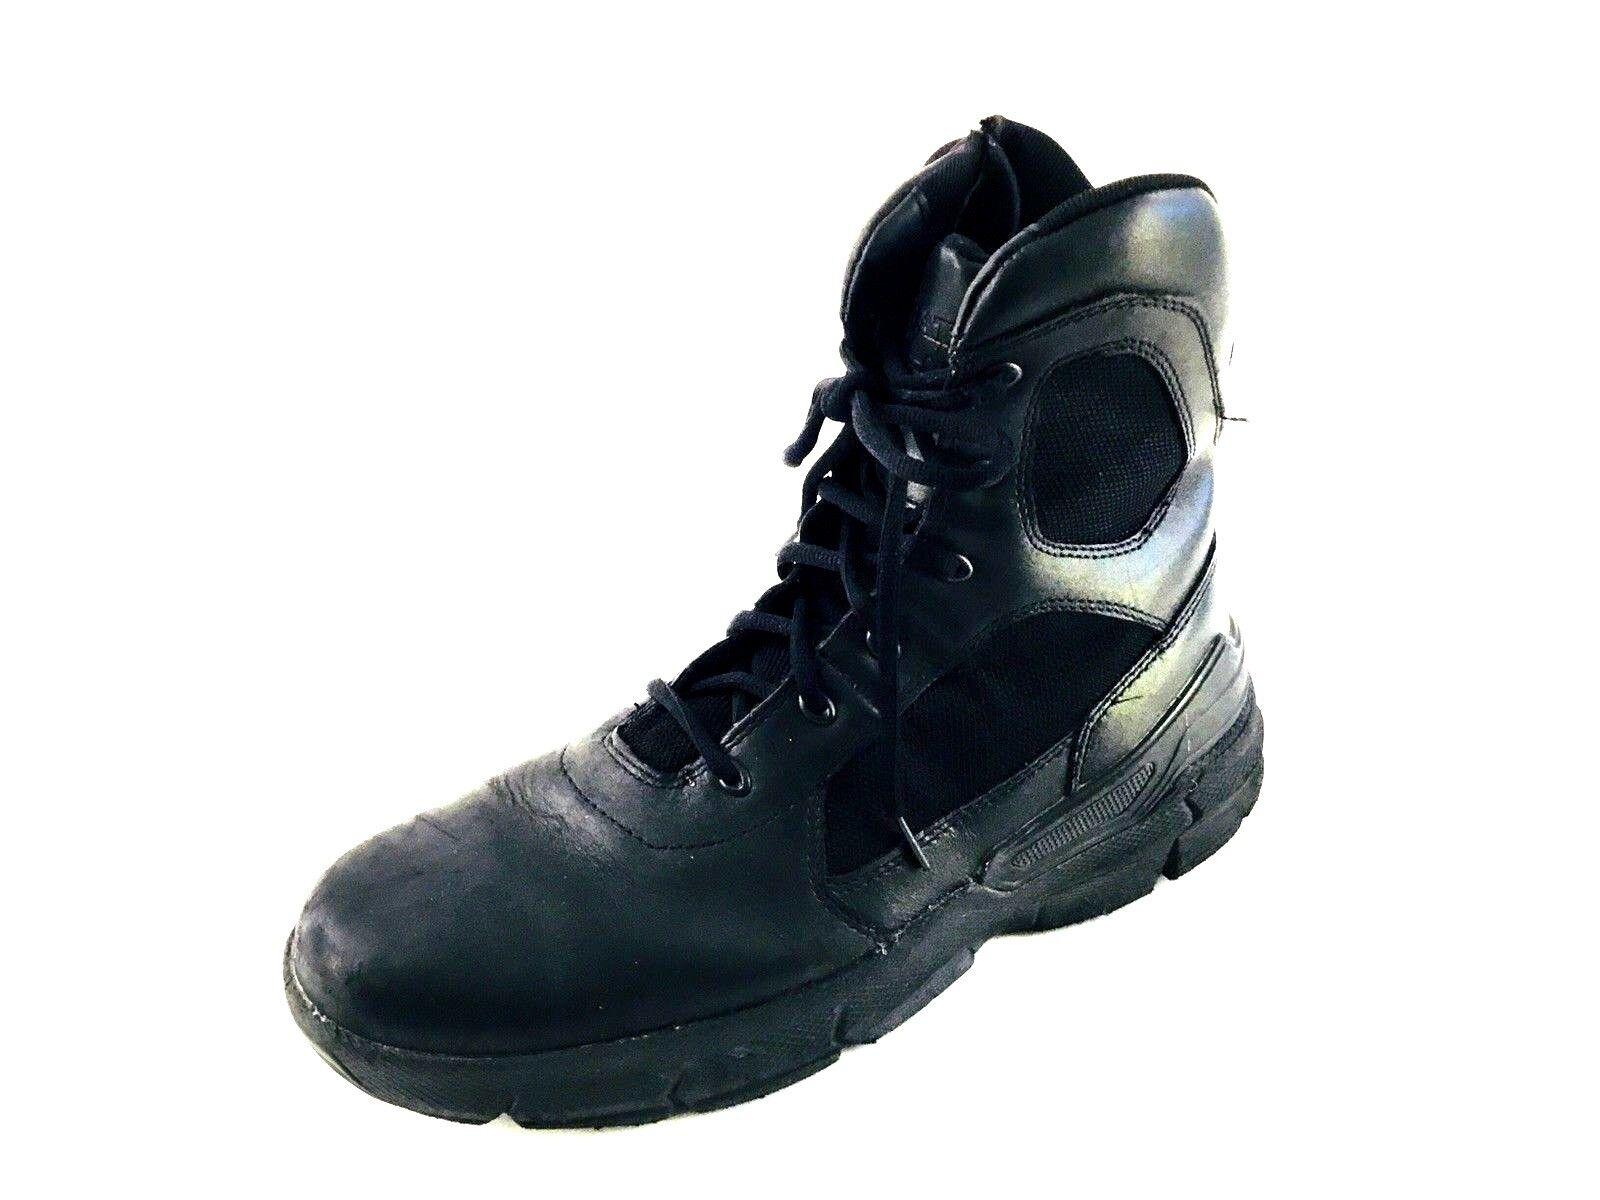 Bates Mens Black Uniform Boots 61225 size 12 Leather Nylon Police Security